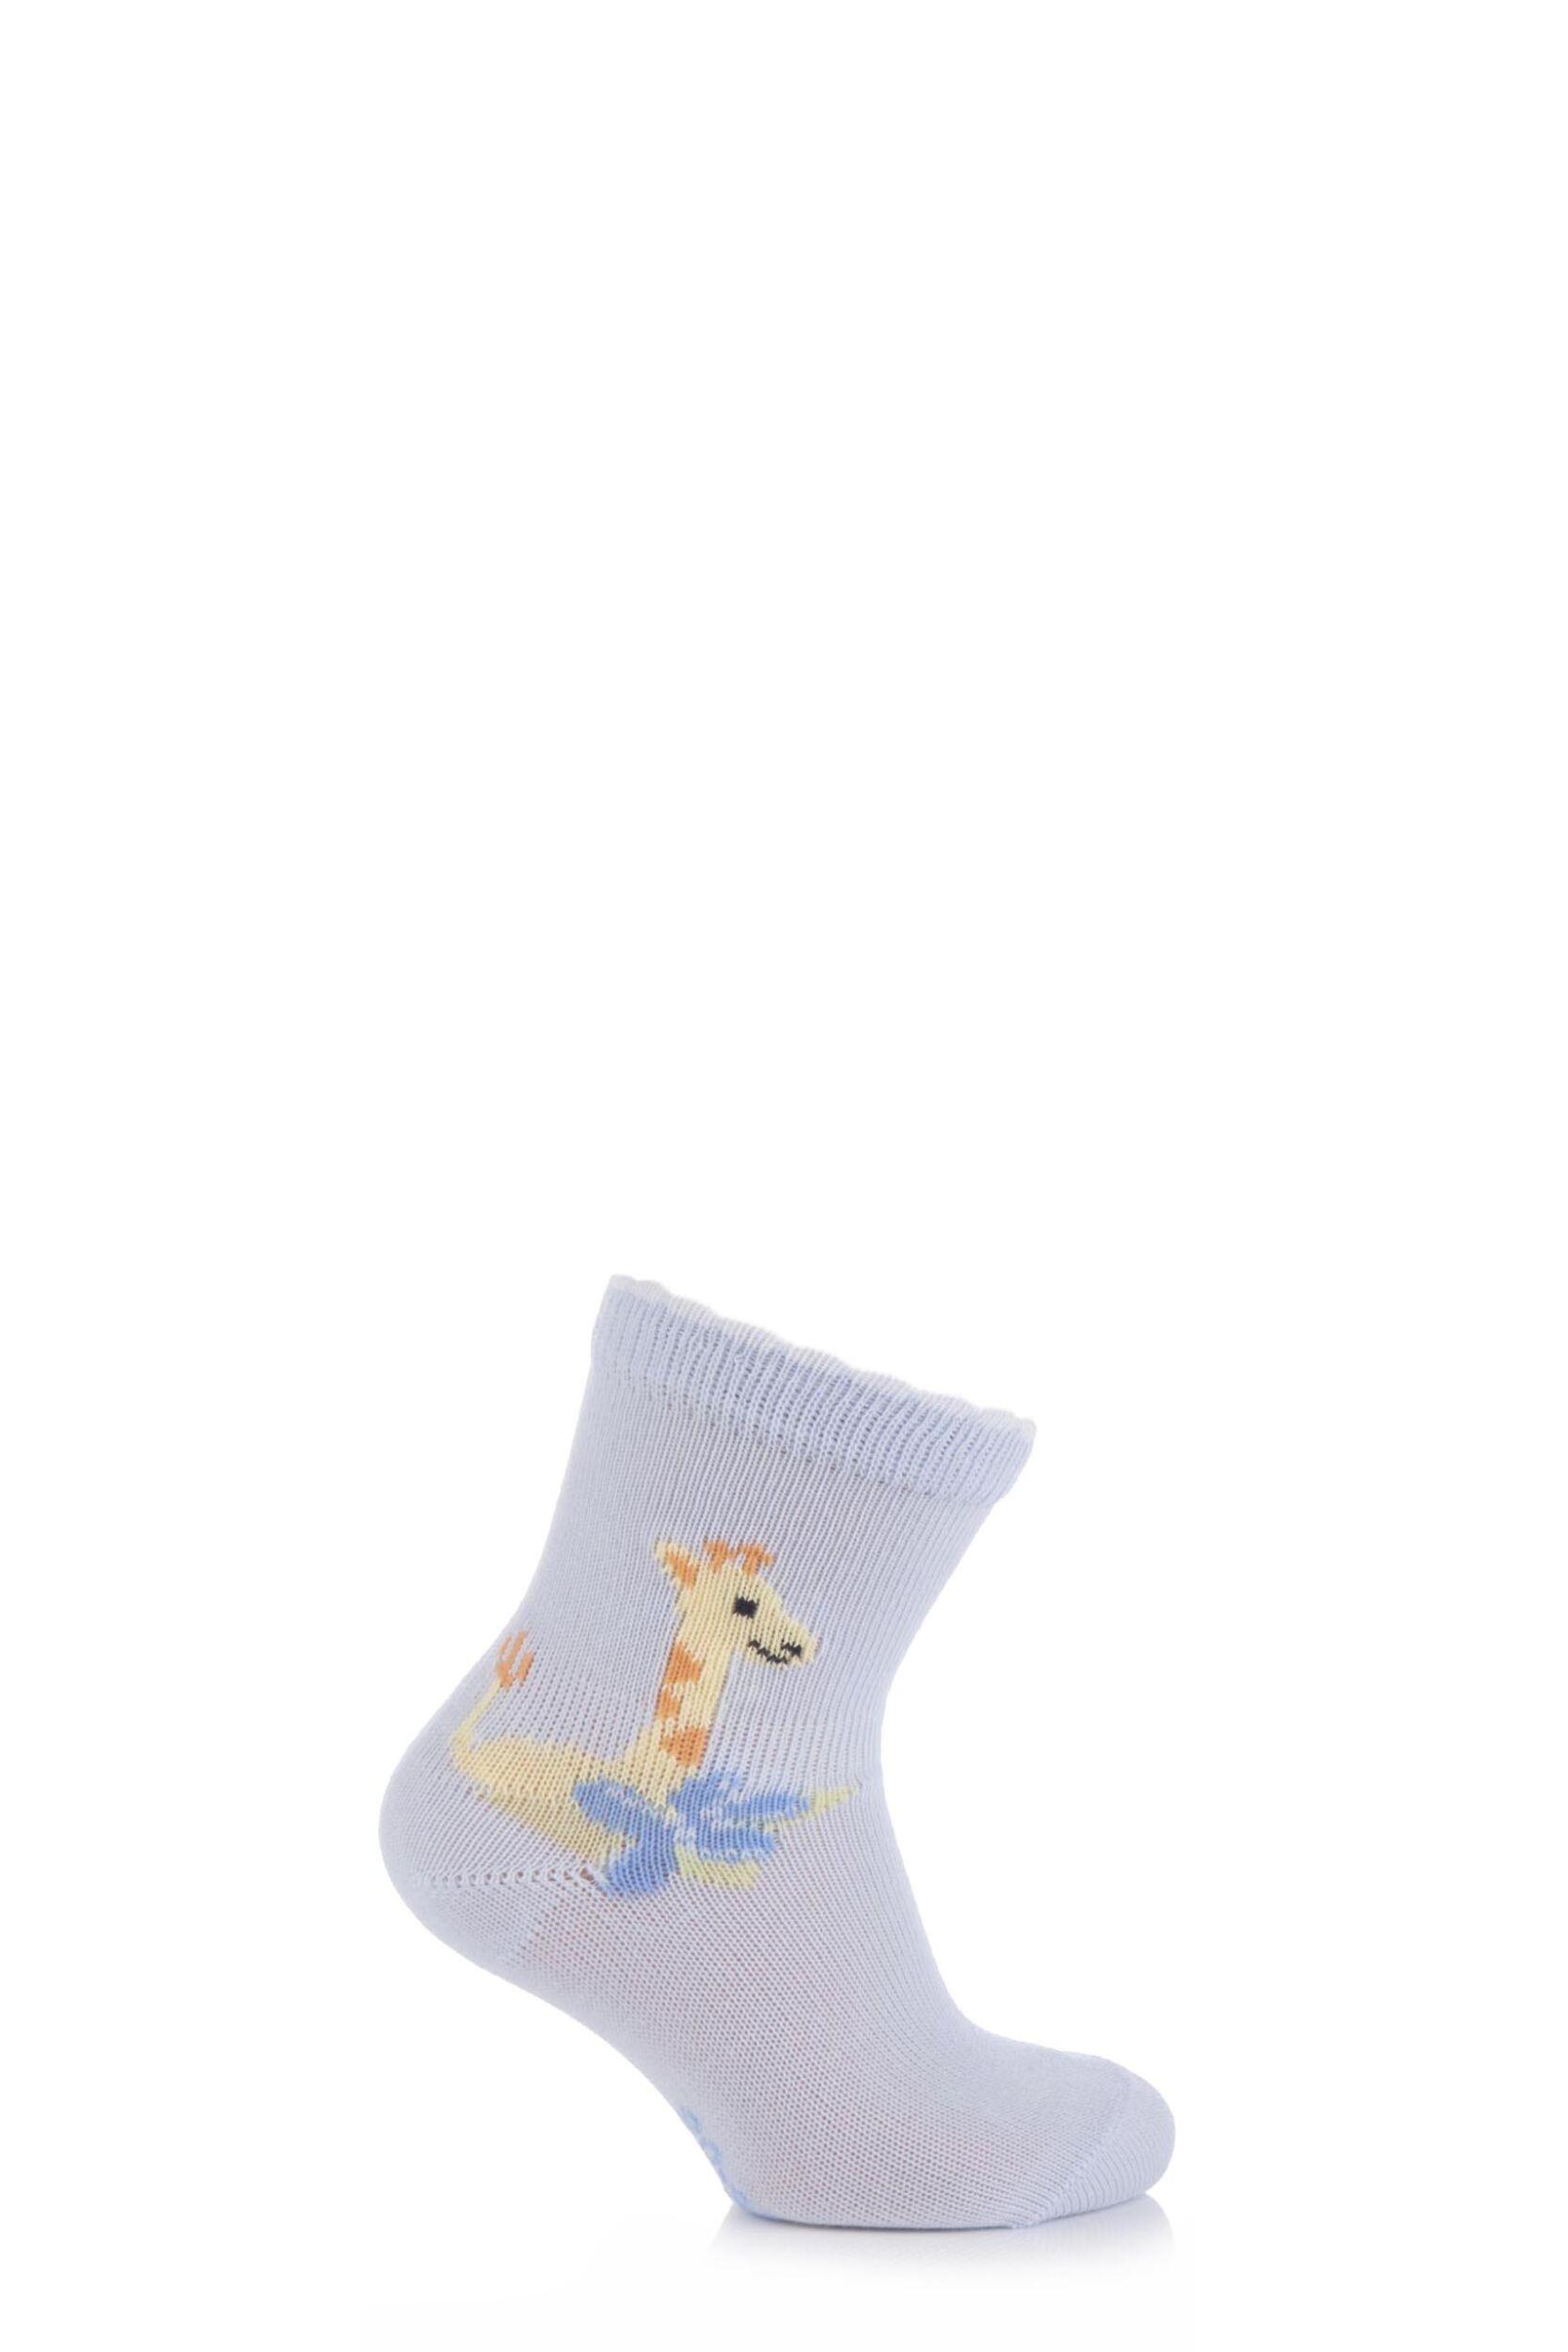 Image of Babies 1 Pair Falke Cotton Giraffe Socks